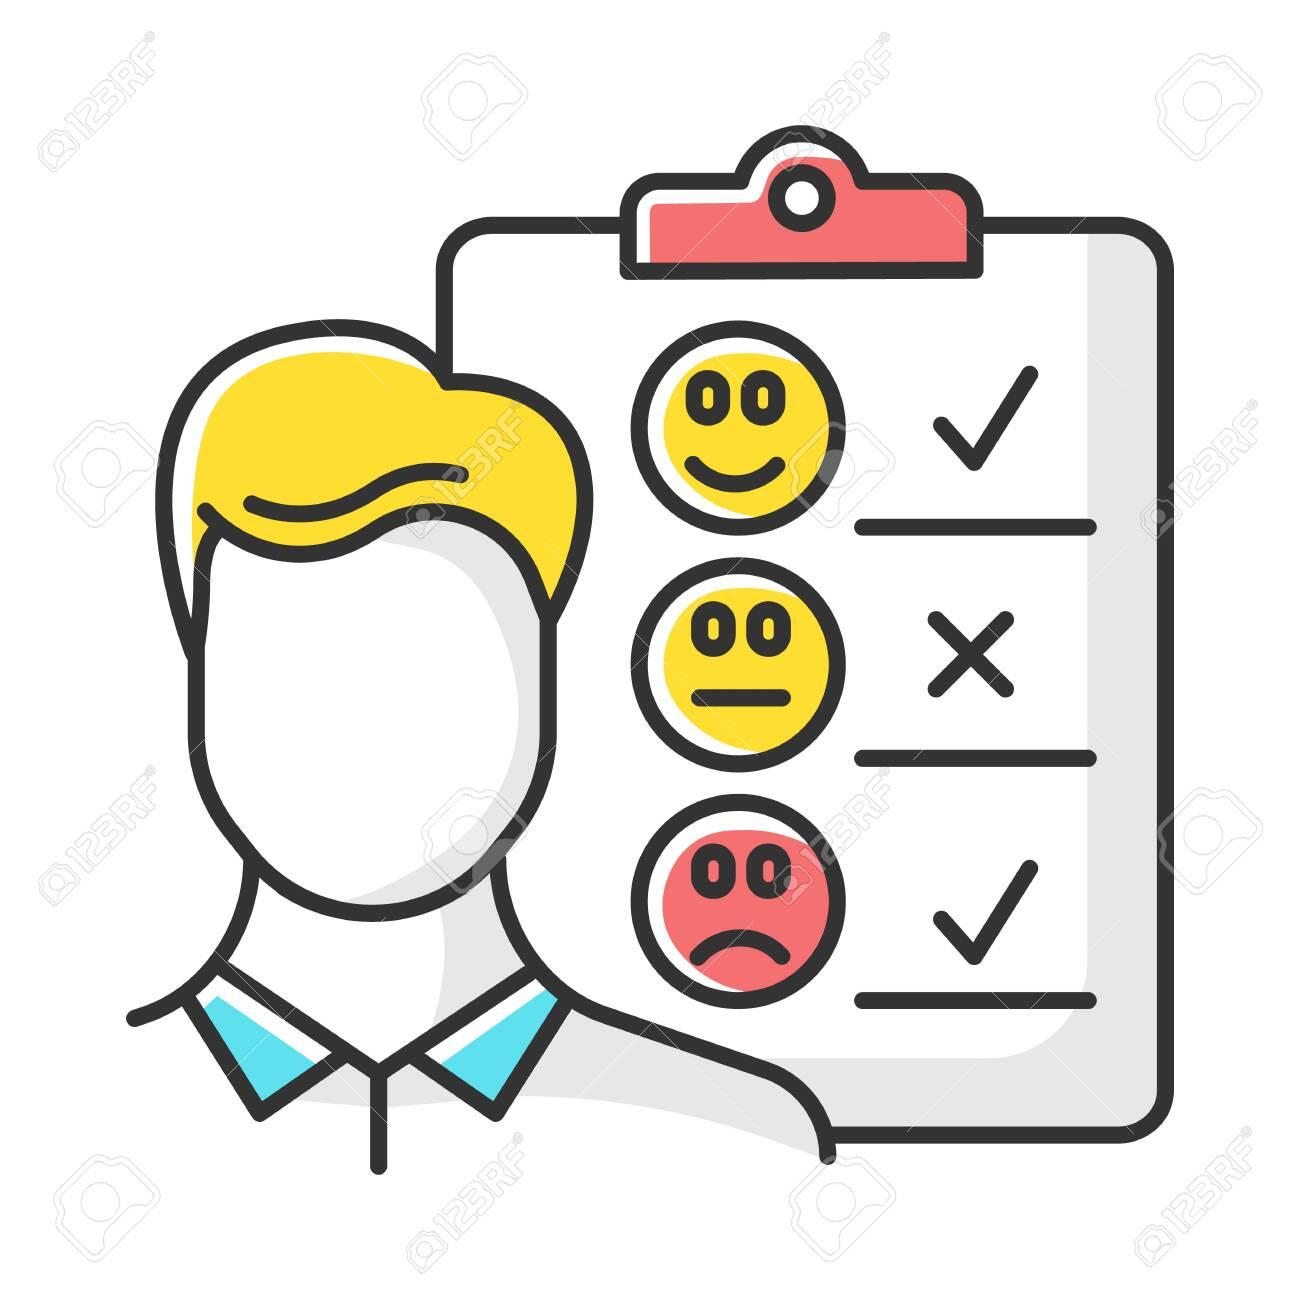 Customer service survey Clip Art   k7816179   Fotosearch